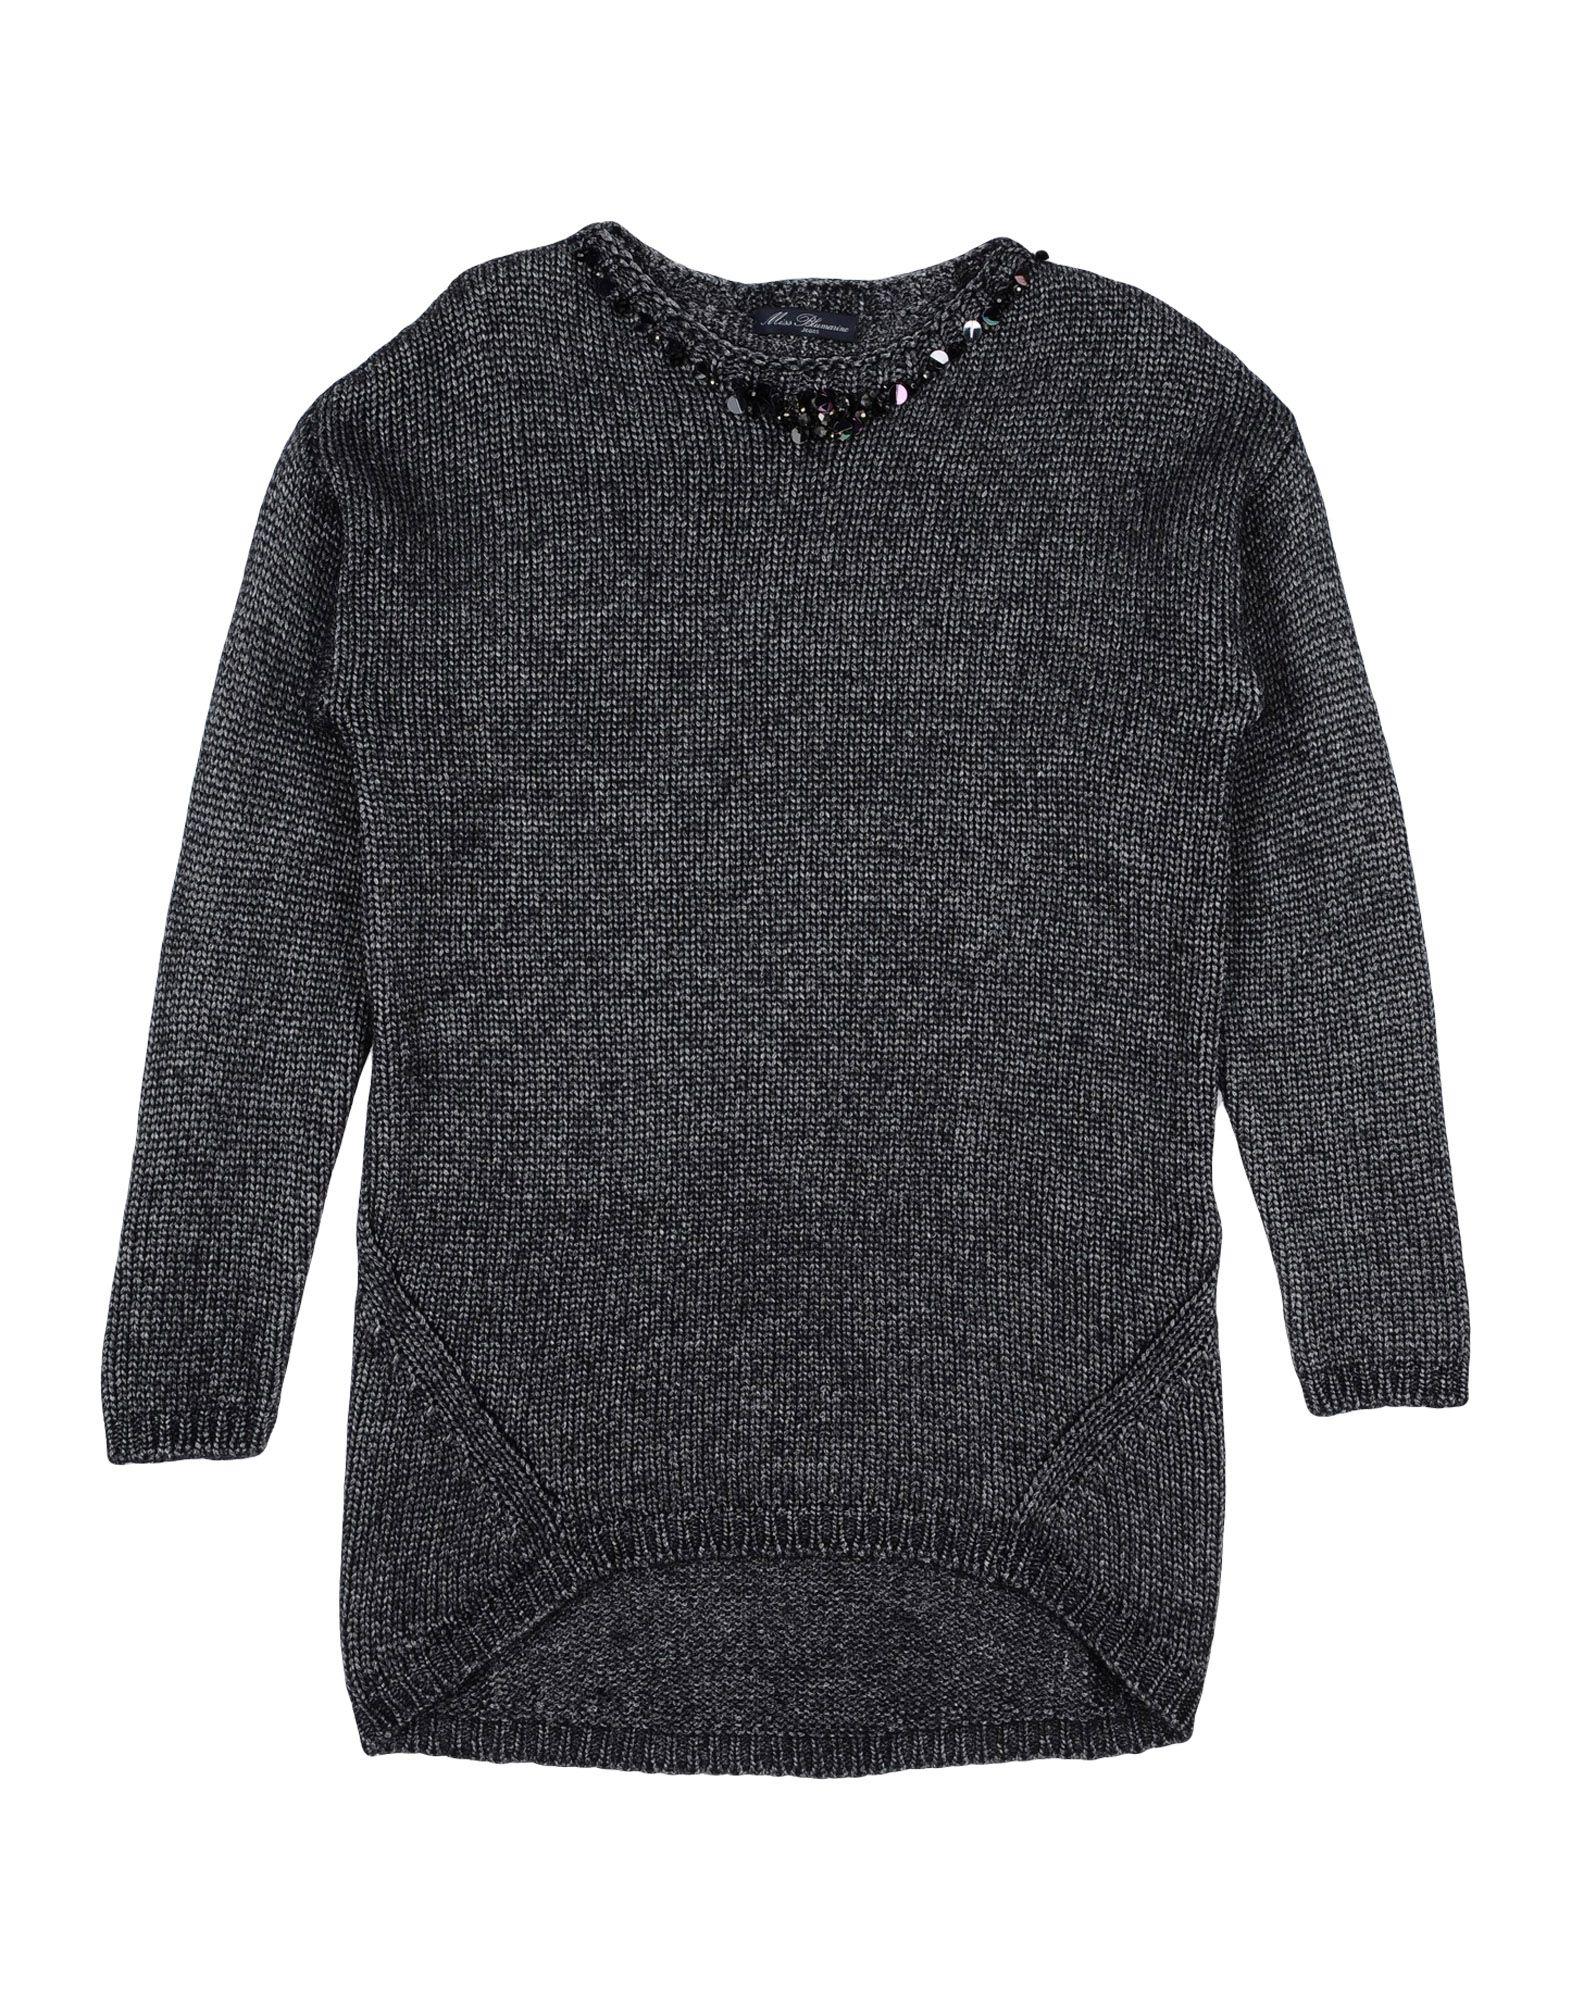 MISS BLUMARINE Sweater in Steel Grey